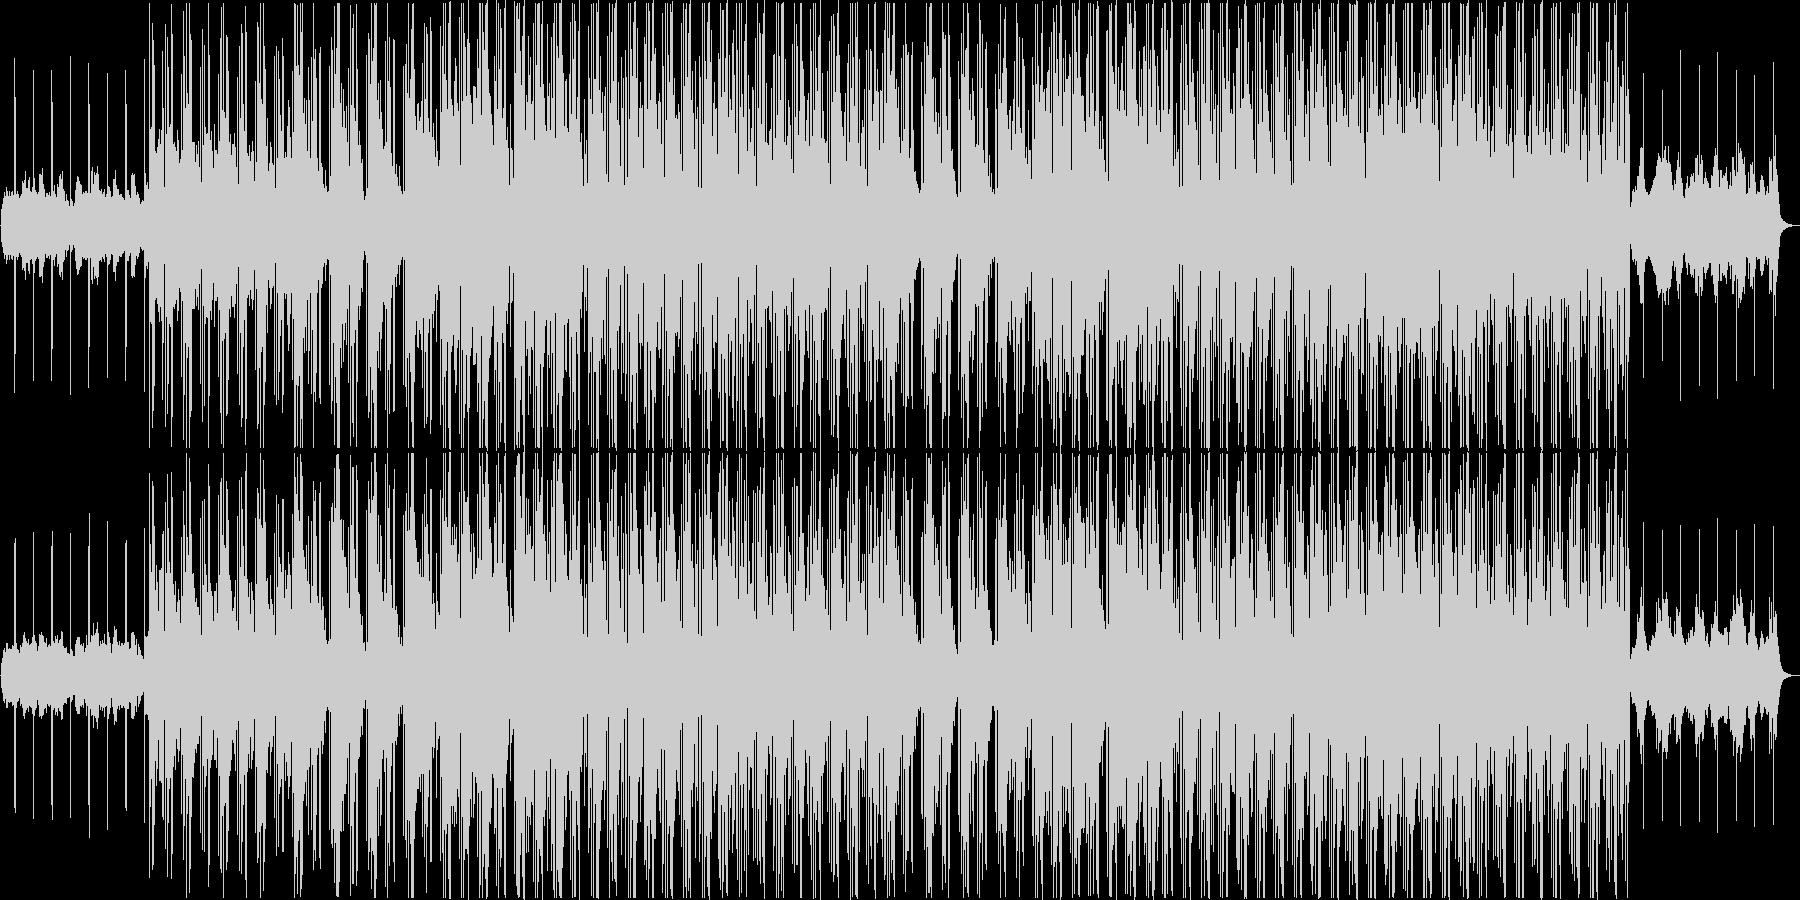 R&B英語/女性ボーカル/お洒落の未再生の波形